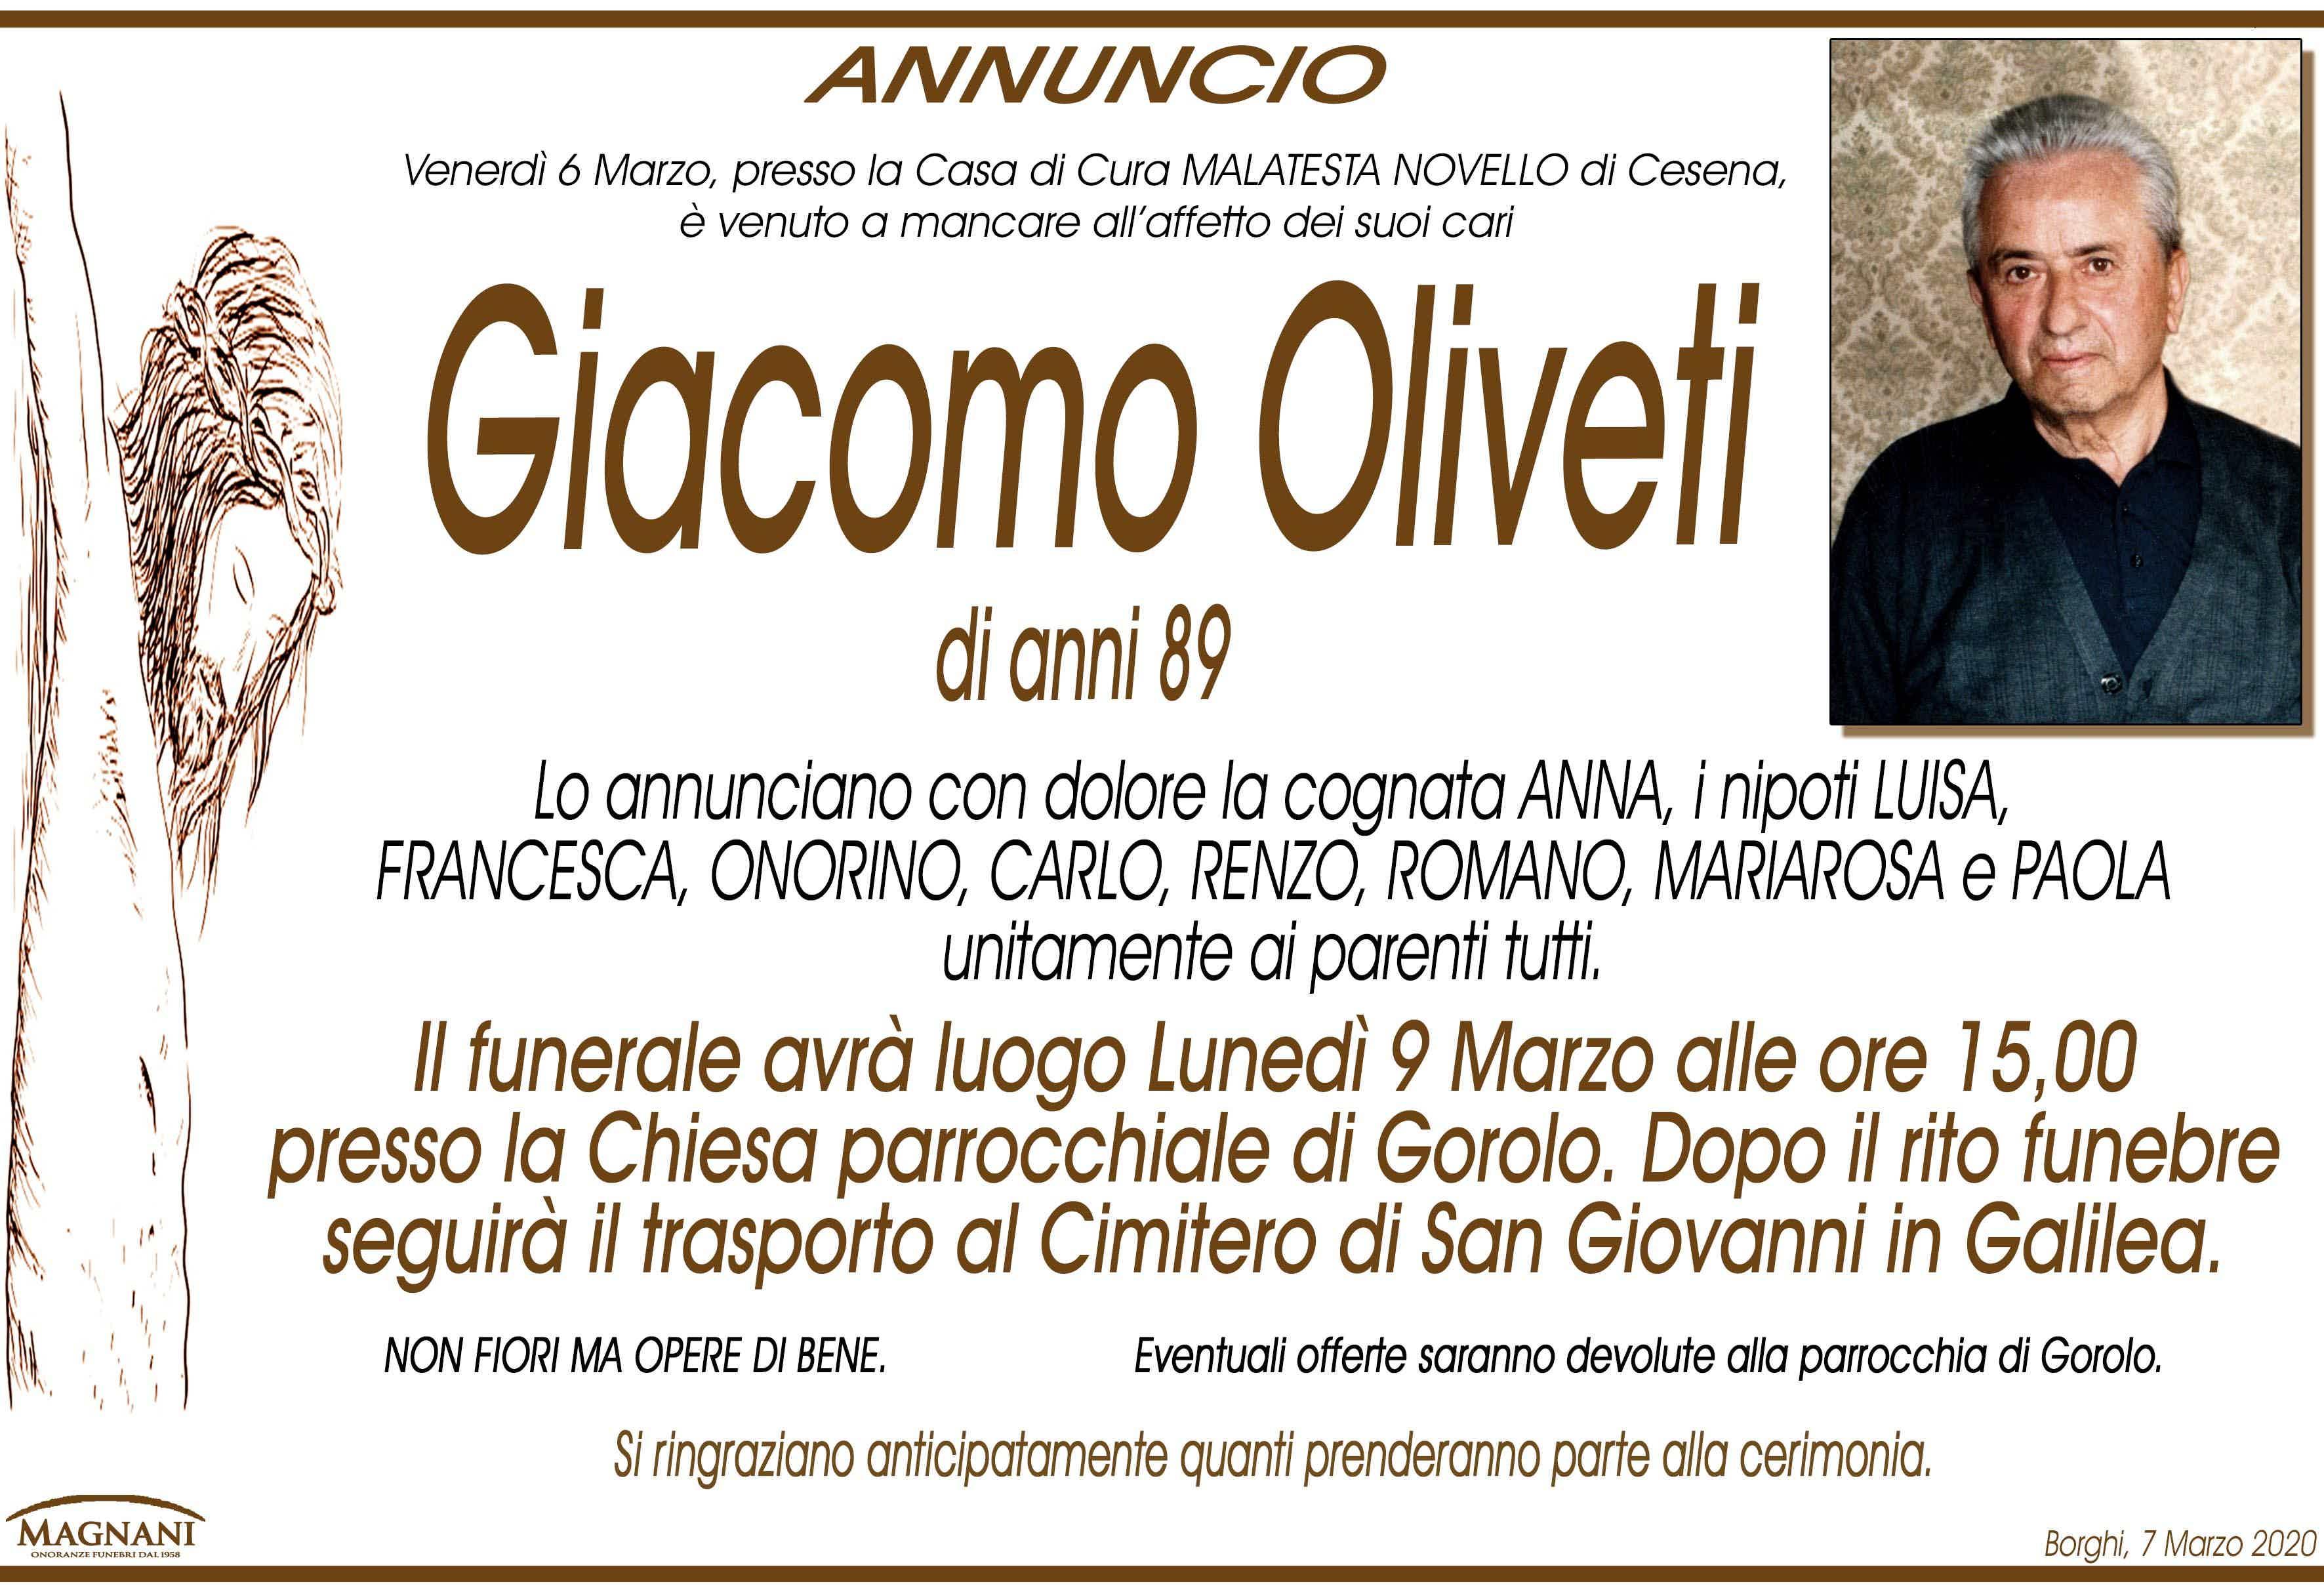 Giacomo Oliveti